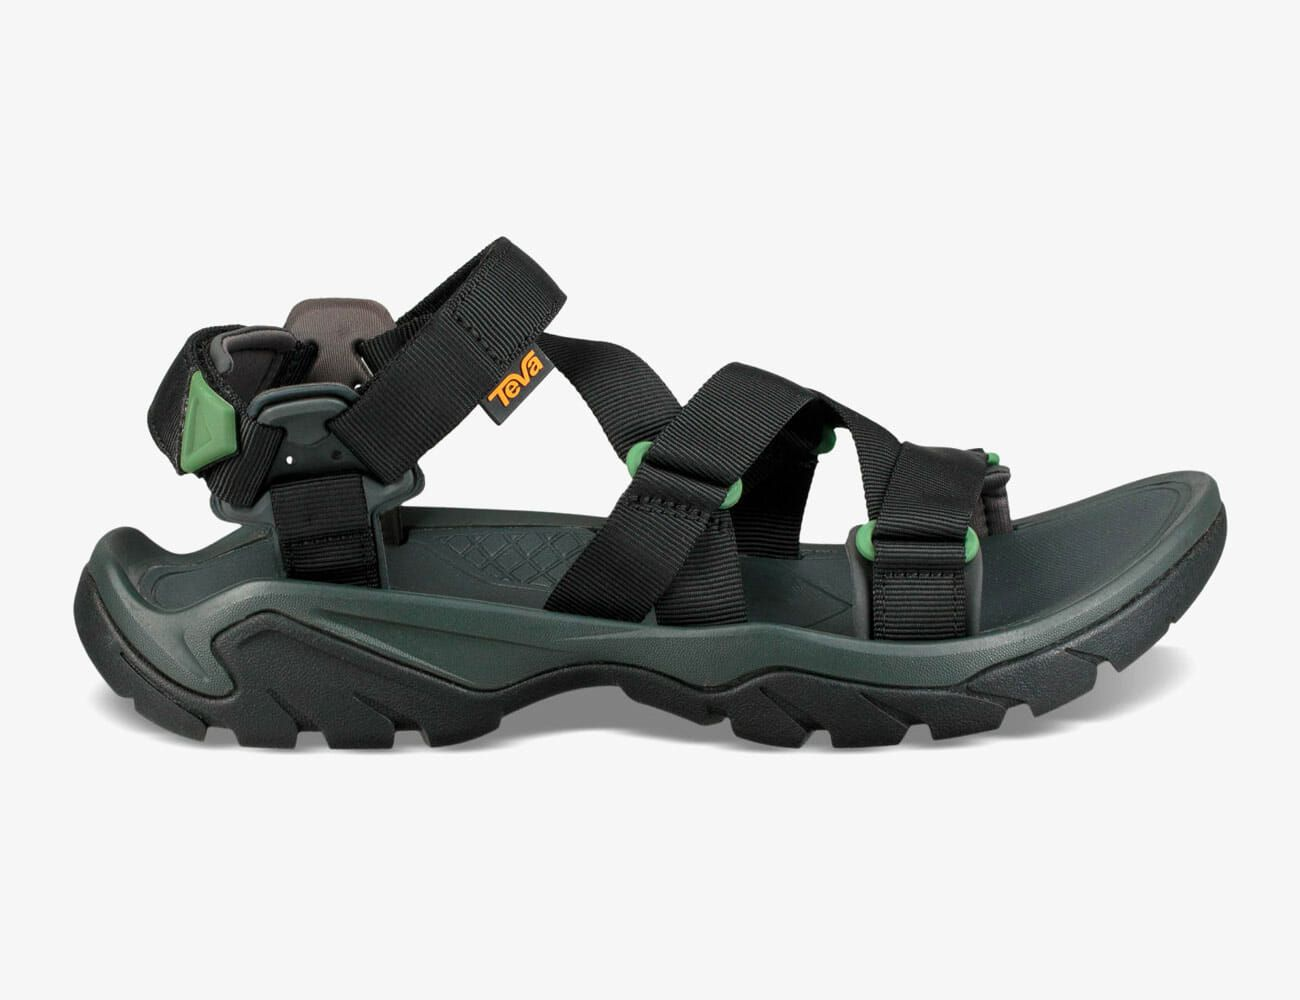 Mens Walking Sandals Nike Womens Teva Hiking Sports For